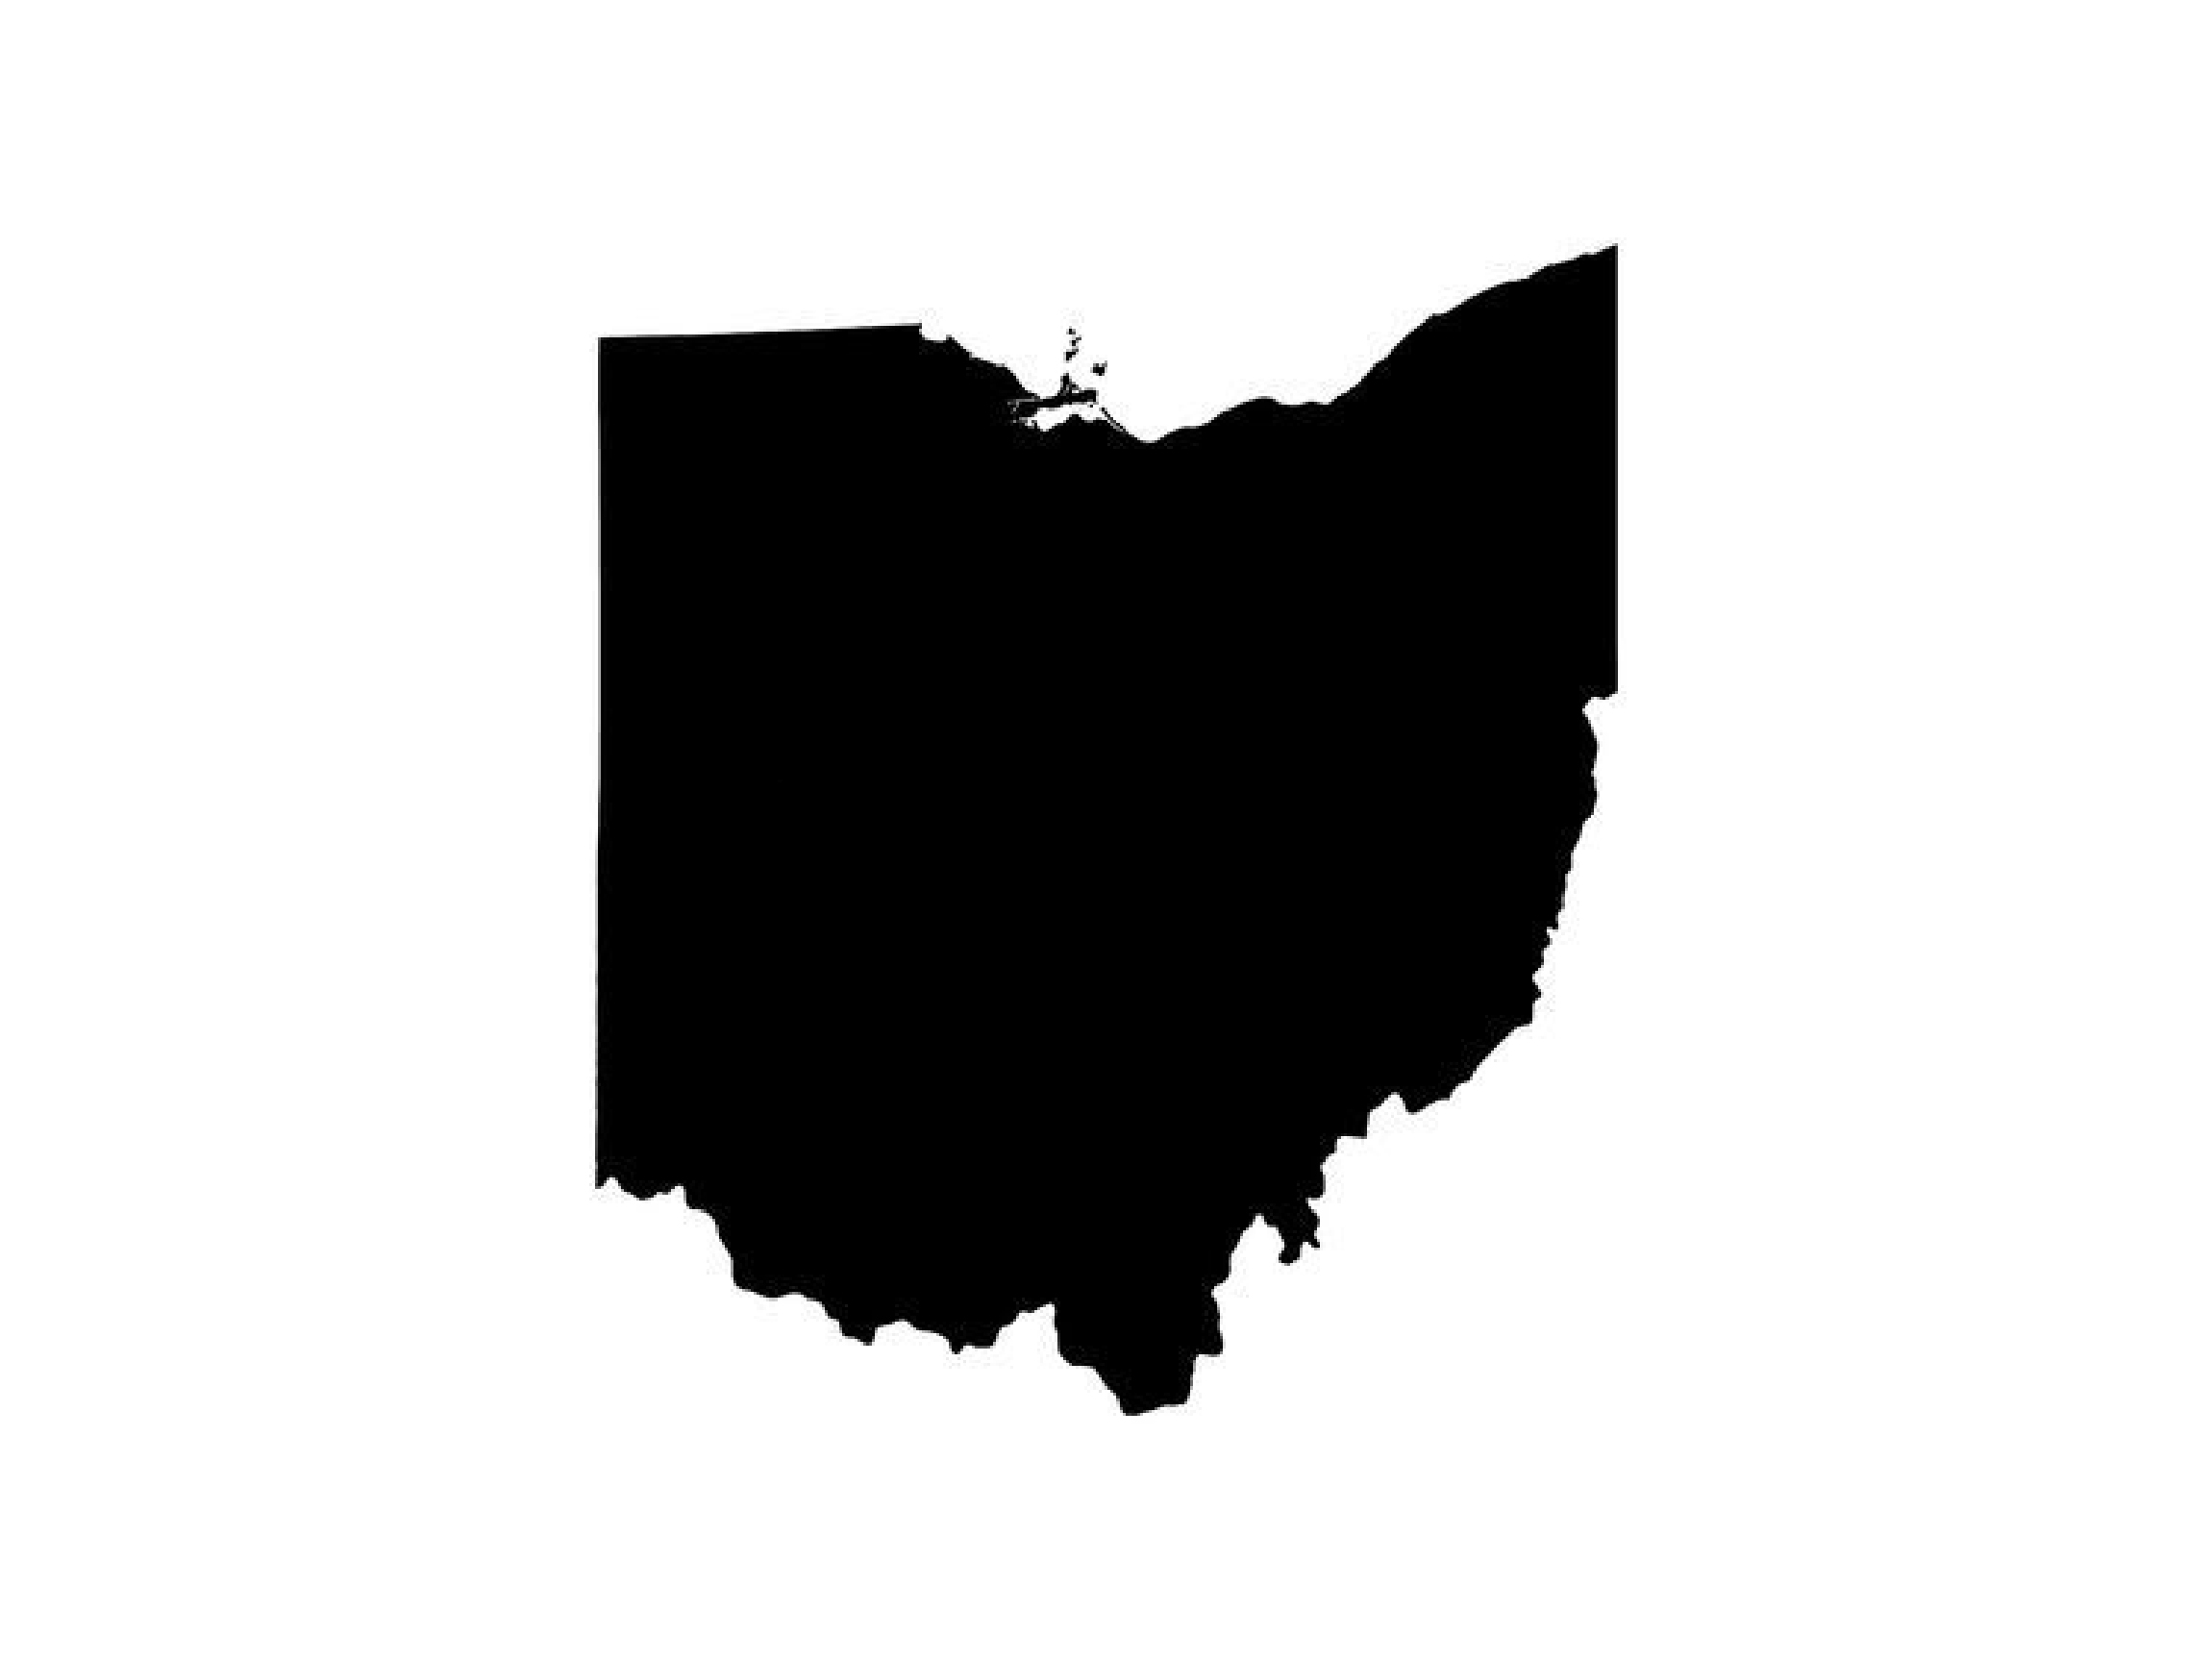 Ohio - Commercial Properties